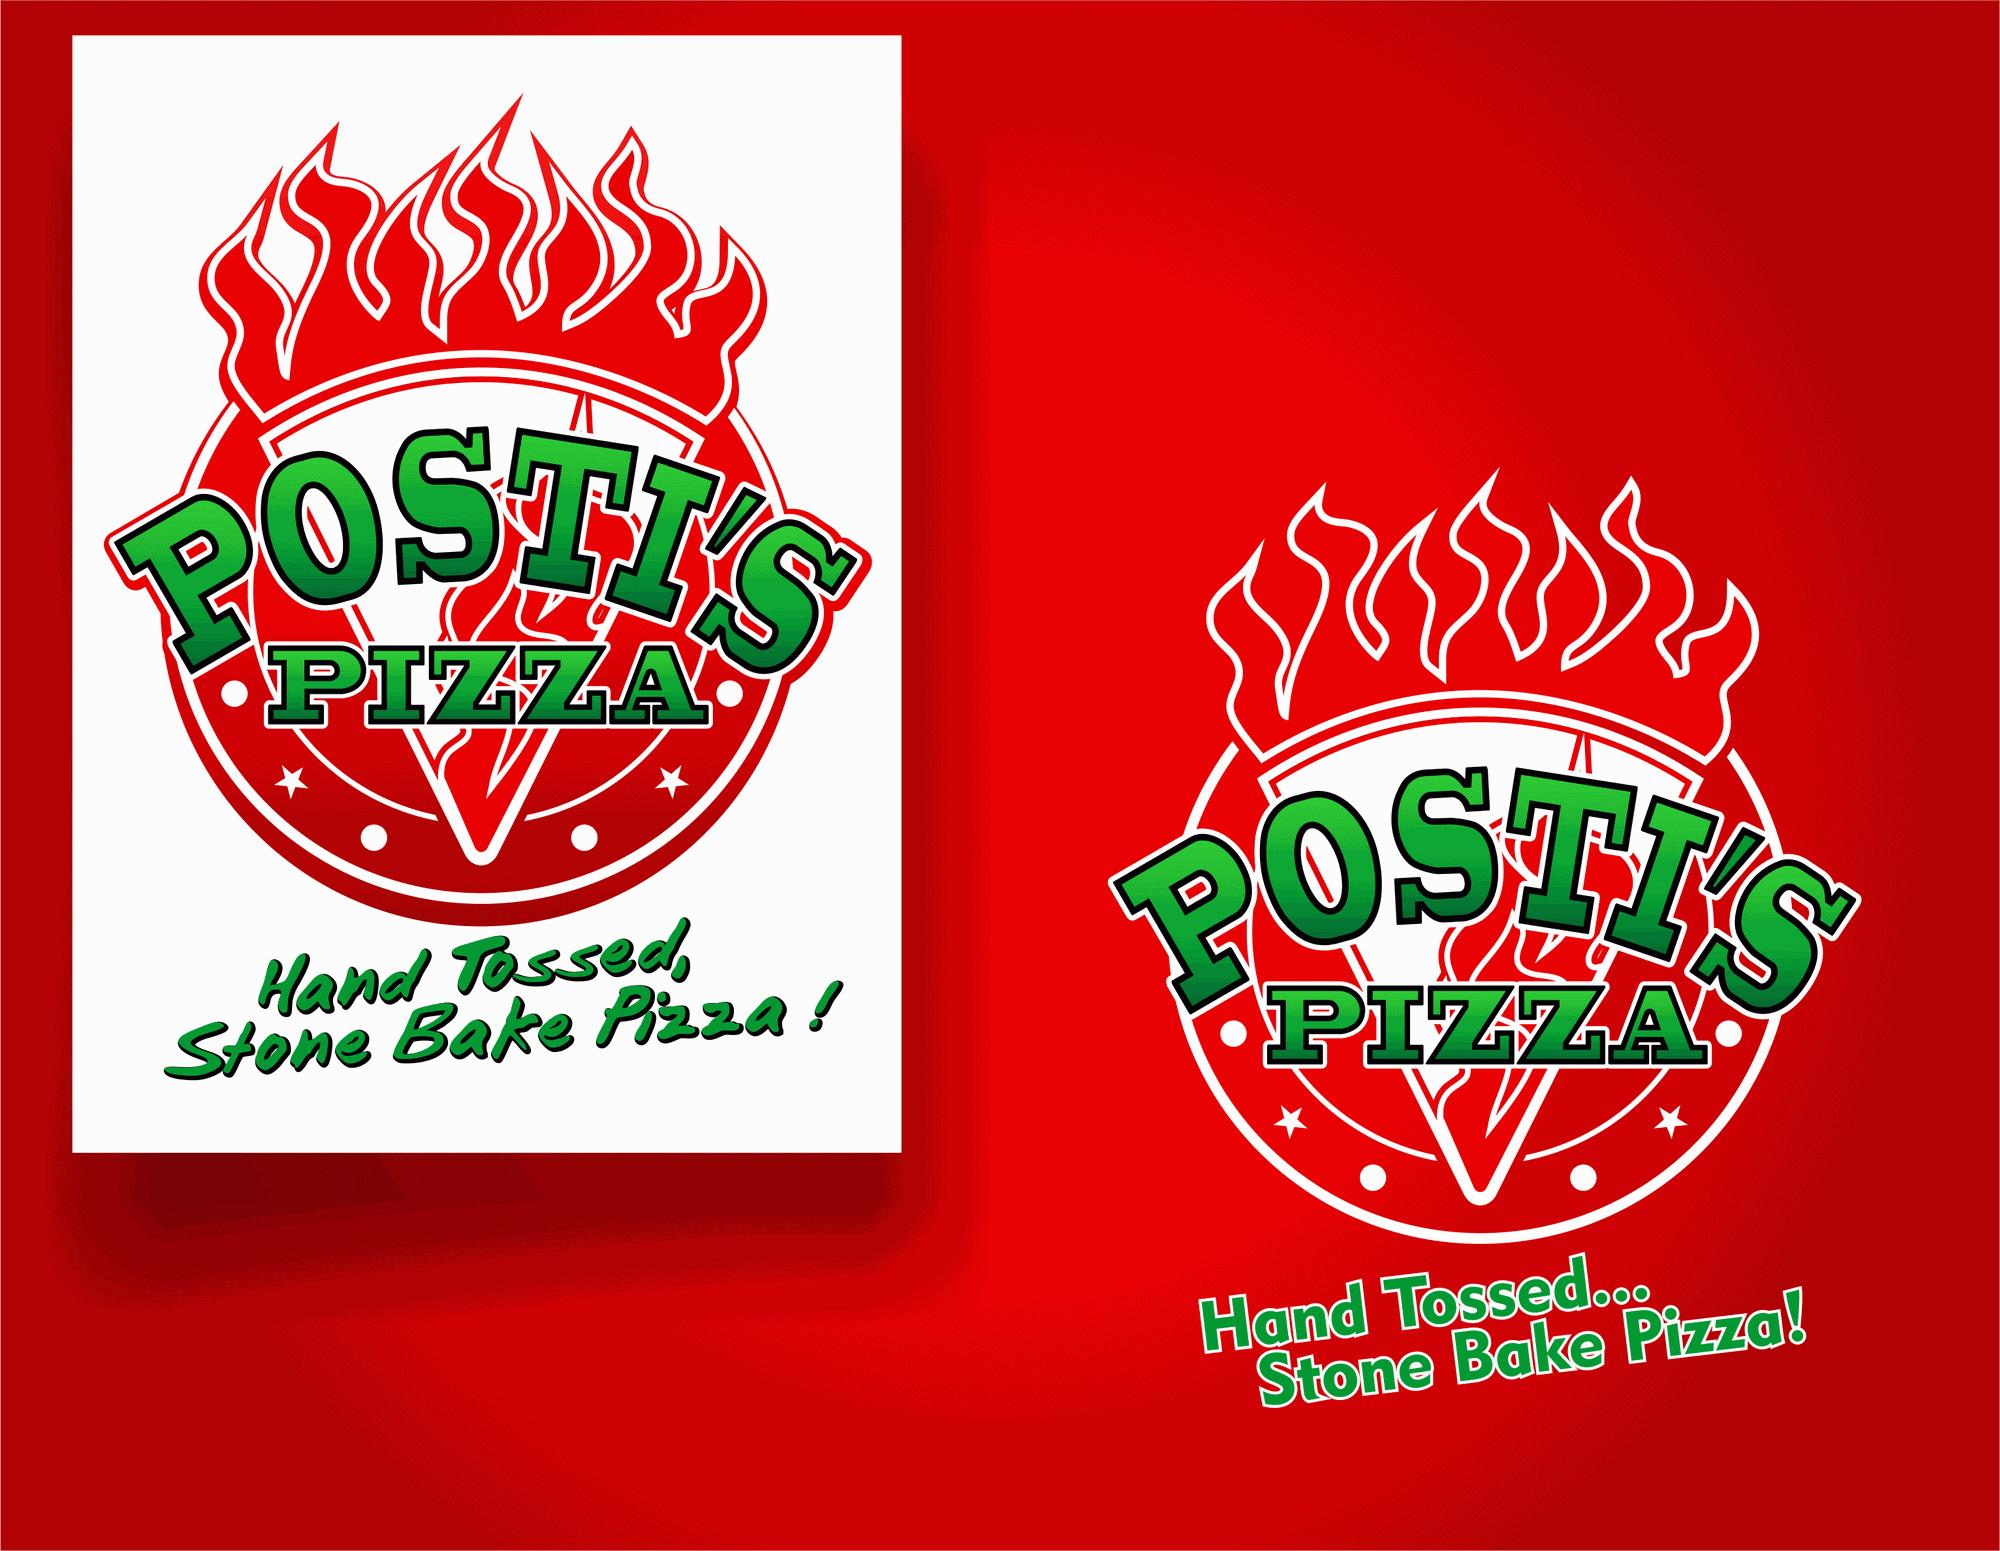 Create a logo for Posti's Pizza